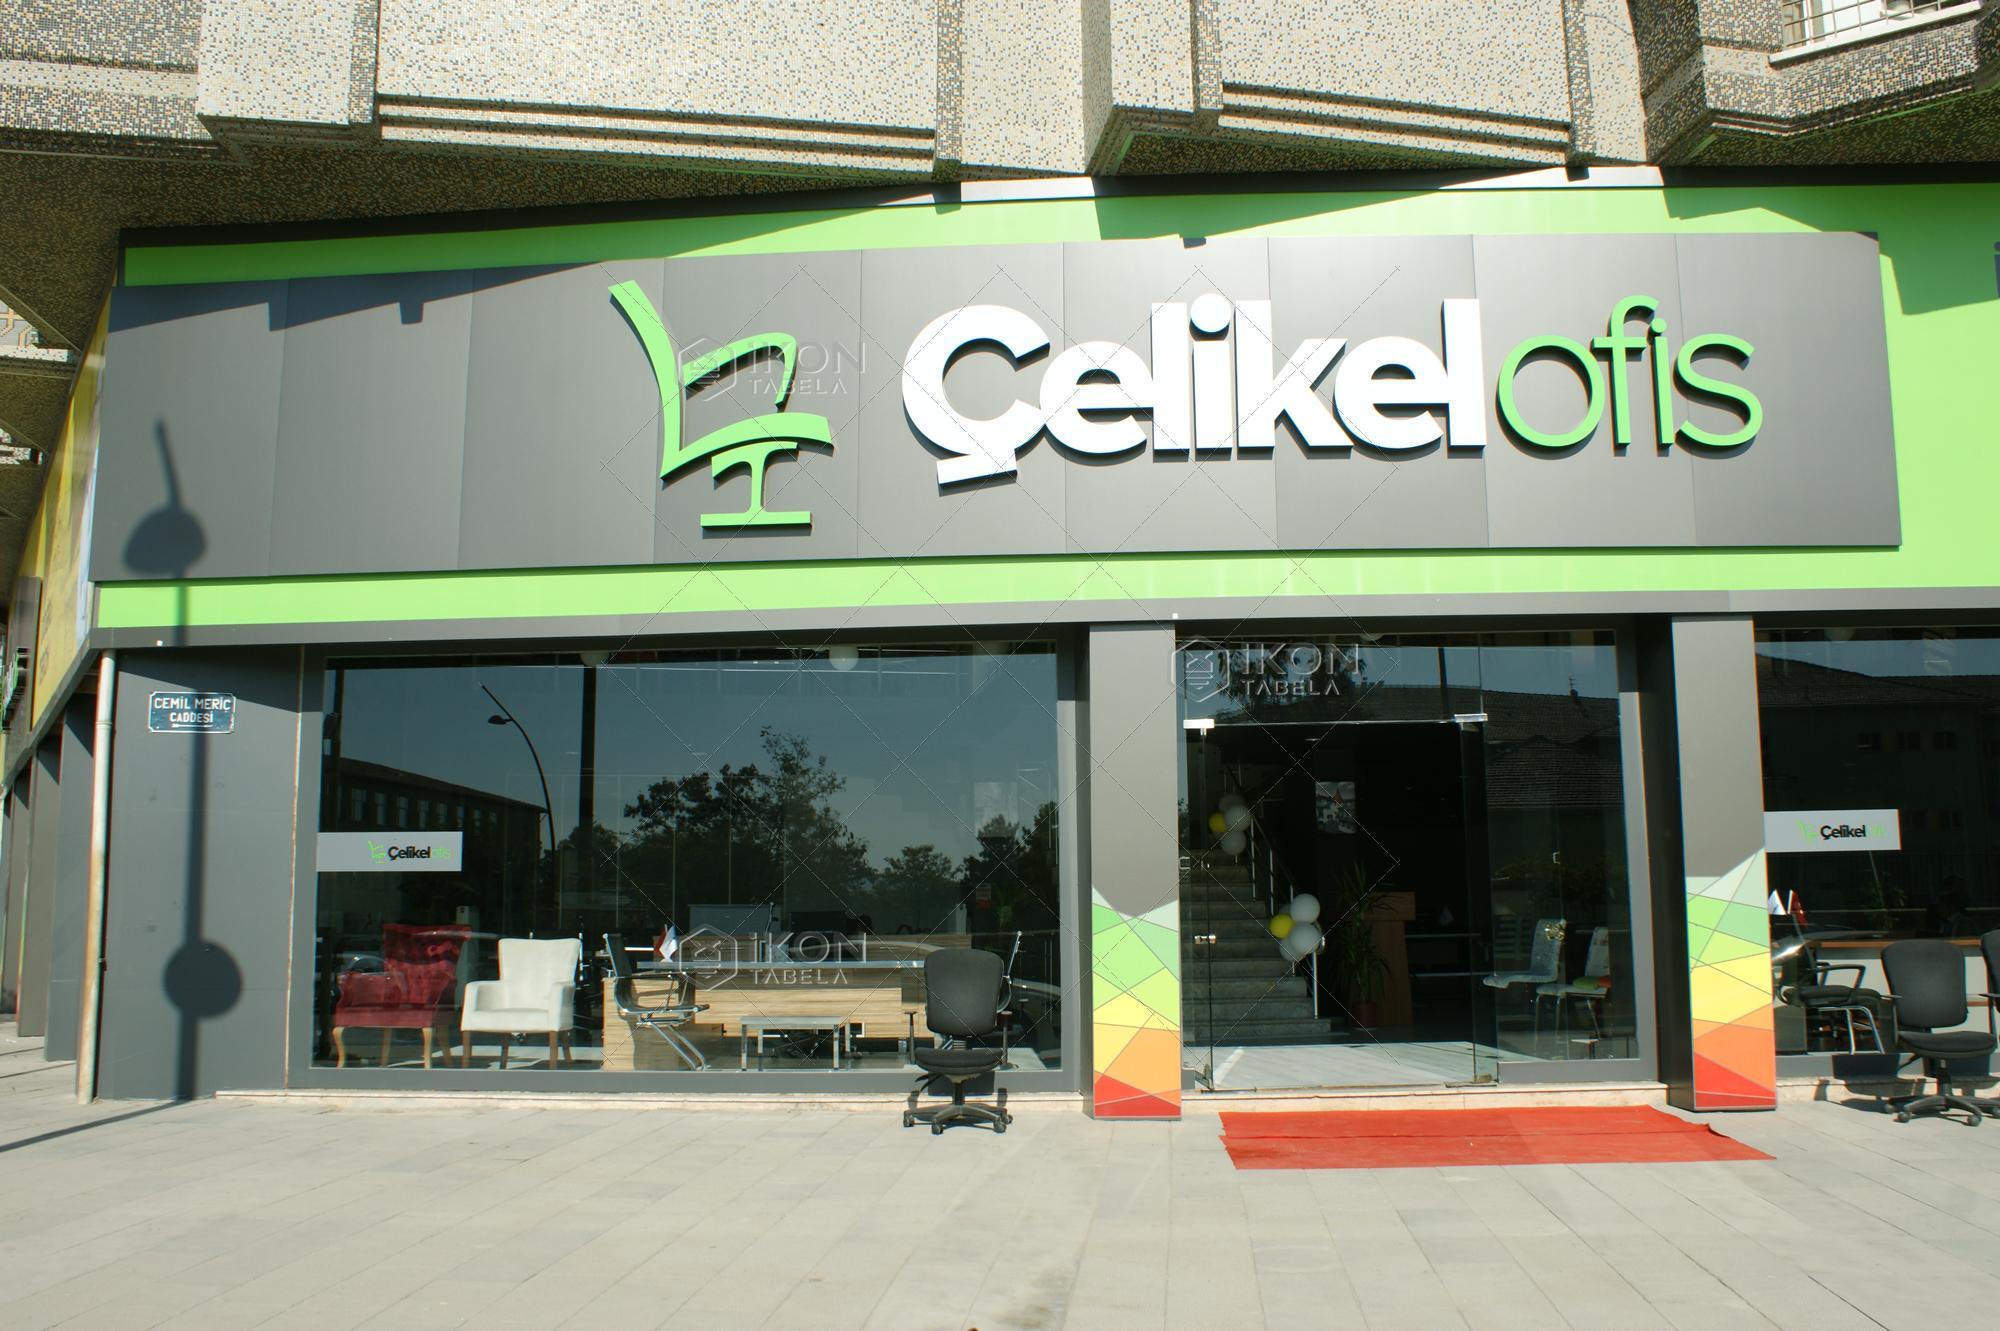 Çelikel Ofis